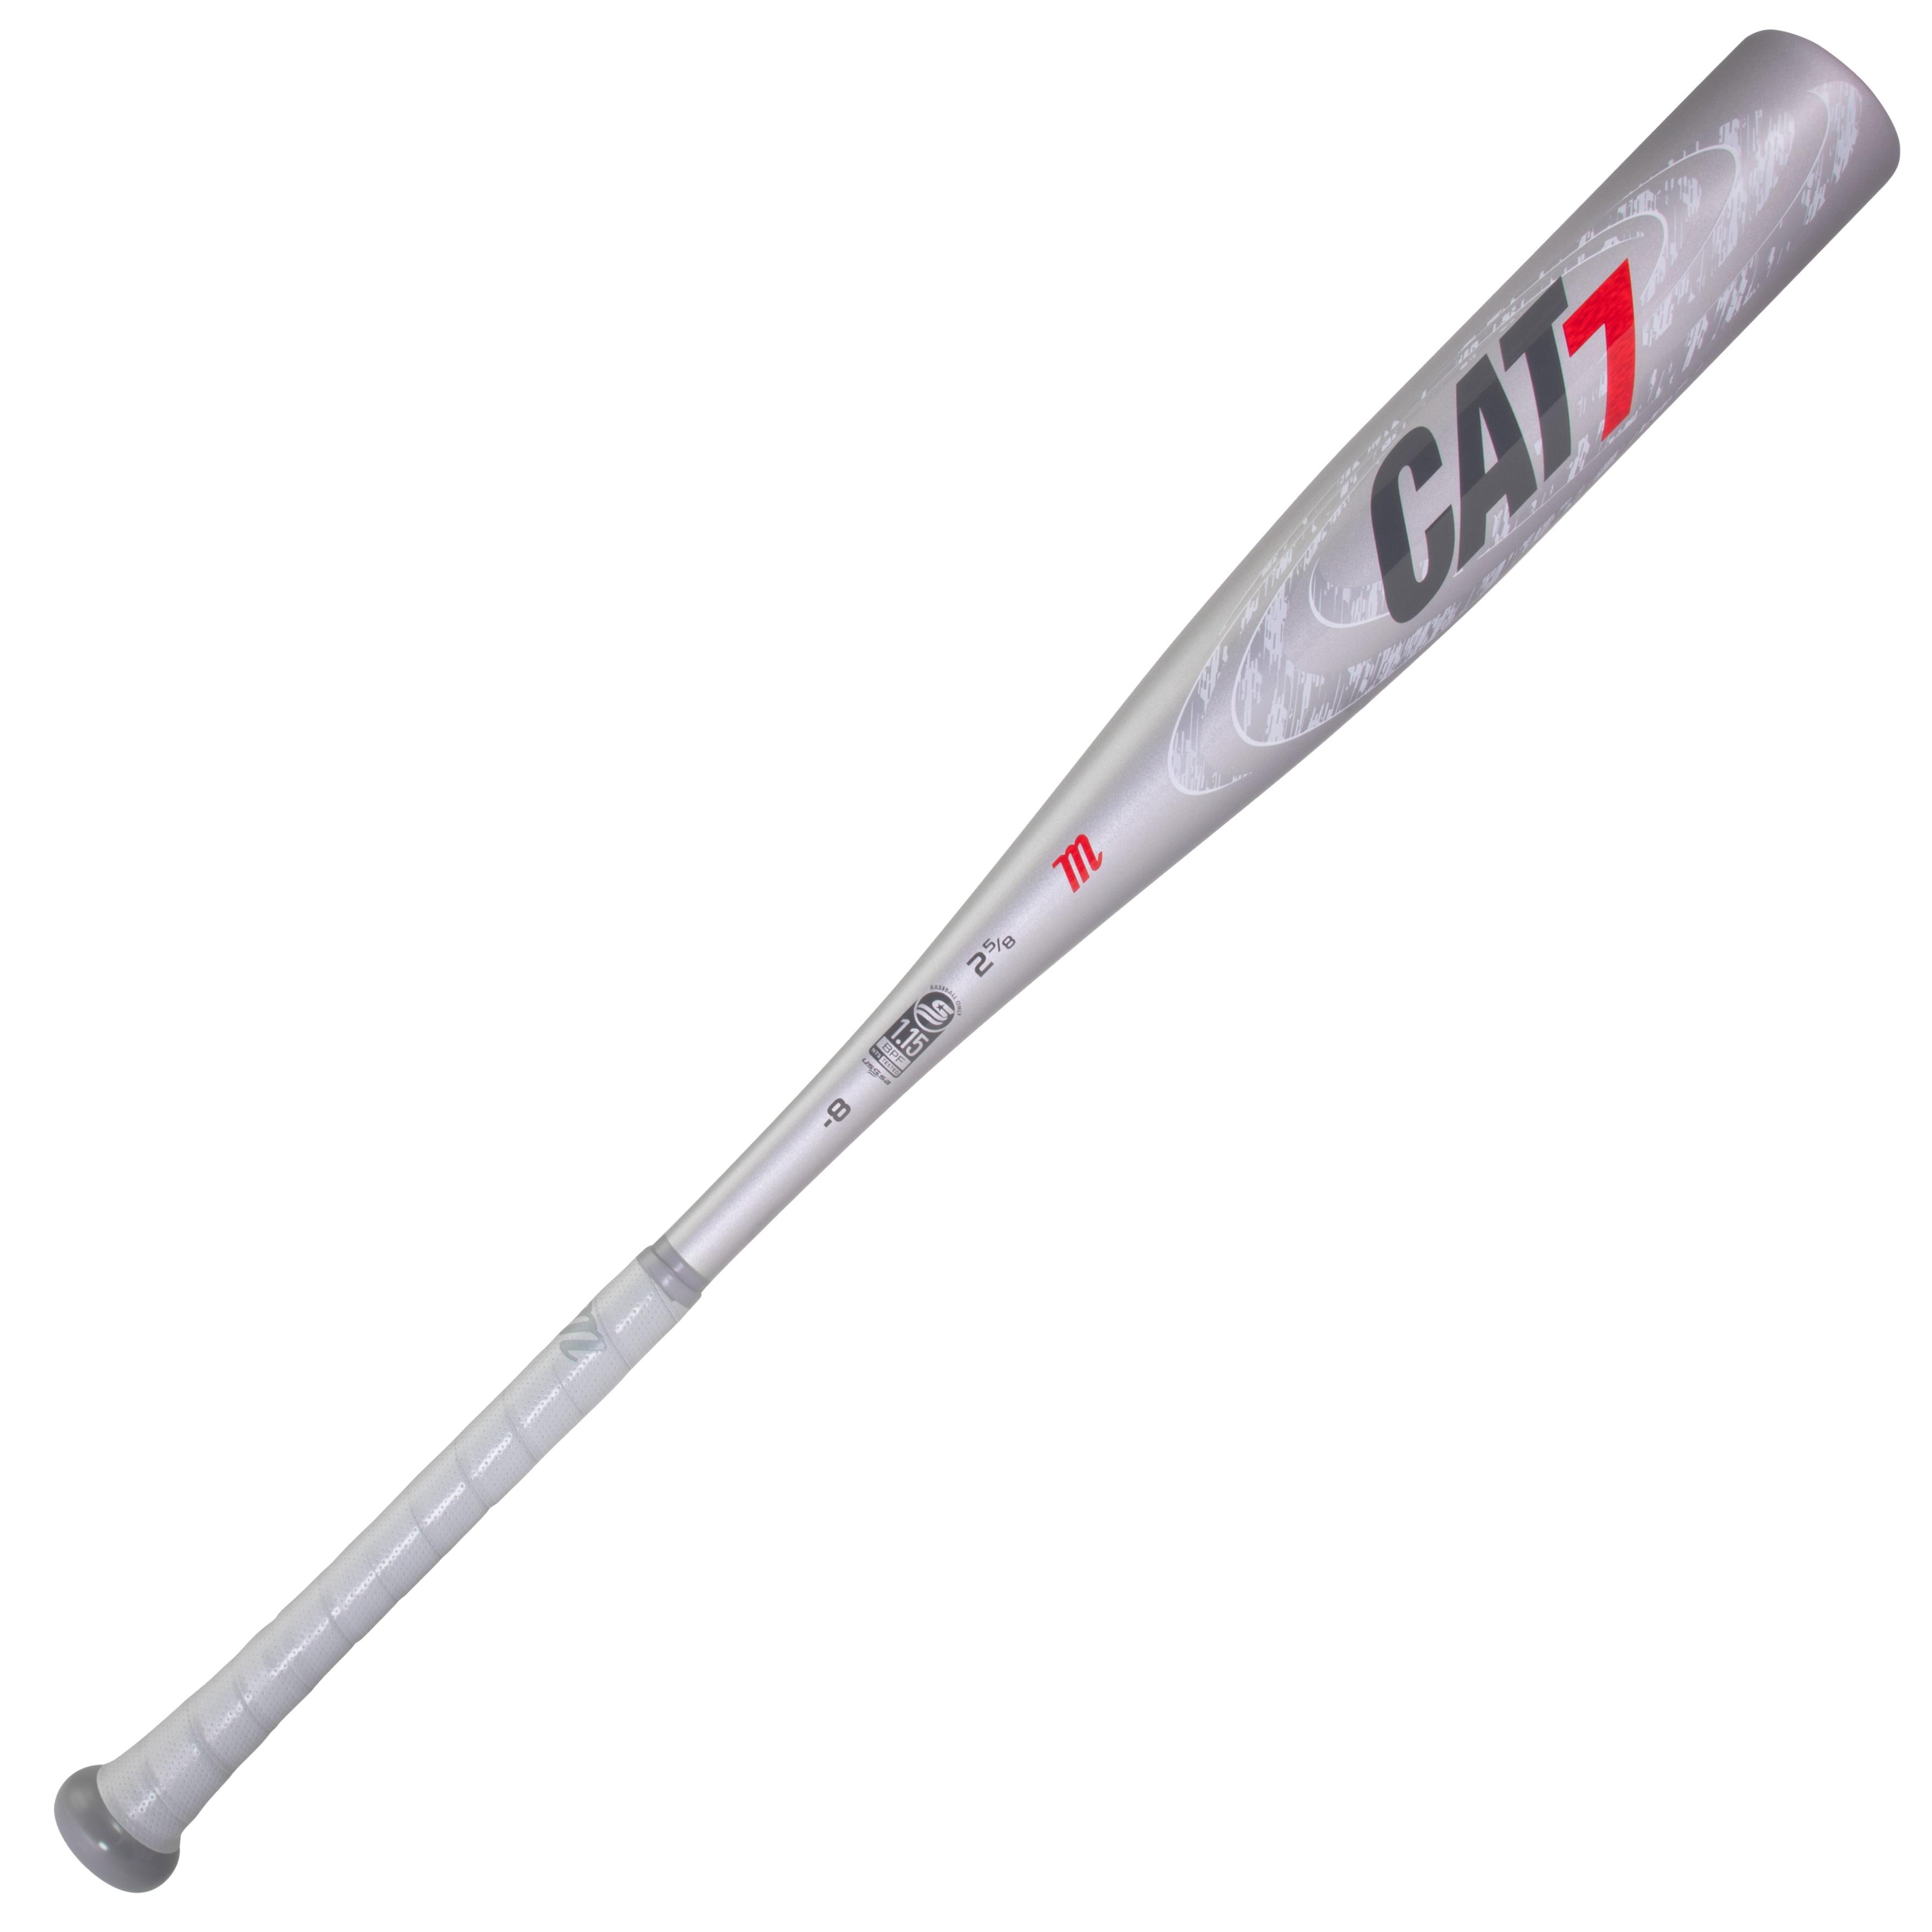 marucci-cat7-silver-8-baseball-bat-31-inch-23-oz MSBC728S-3123